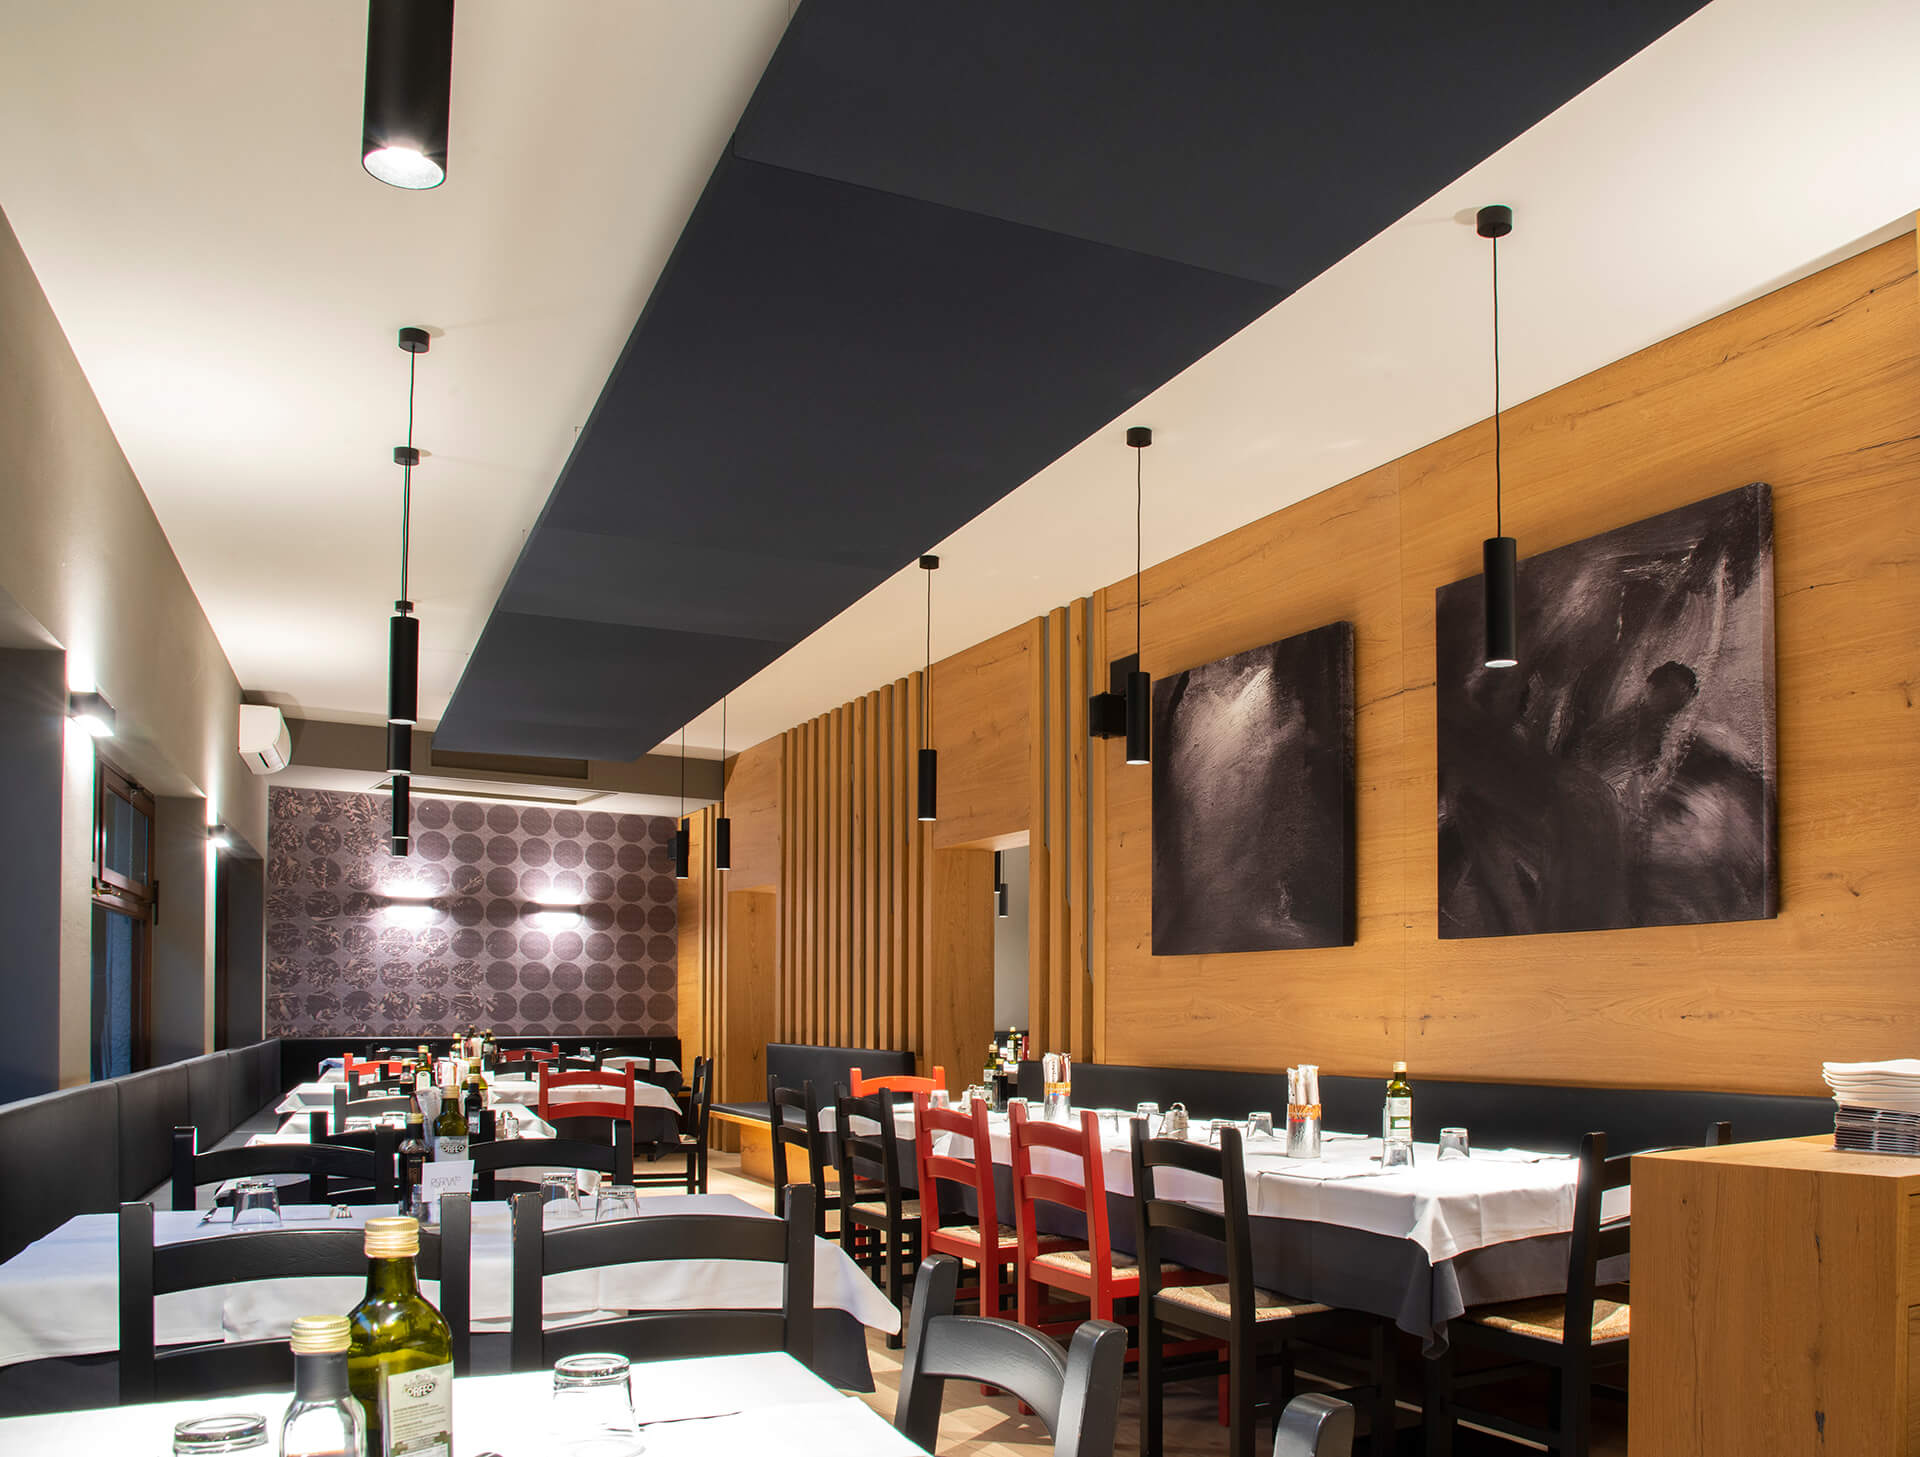 Restaurant Cafe Bar Ses Yalıtımı